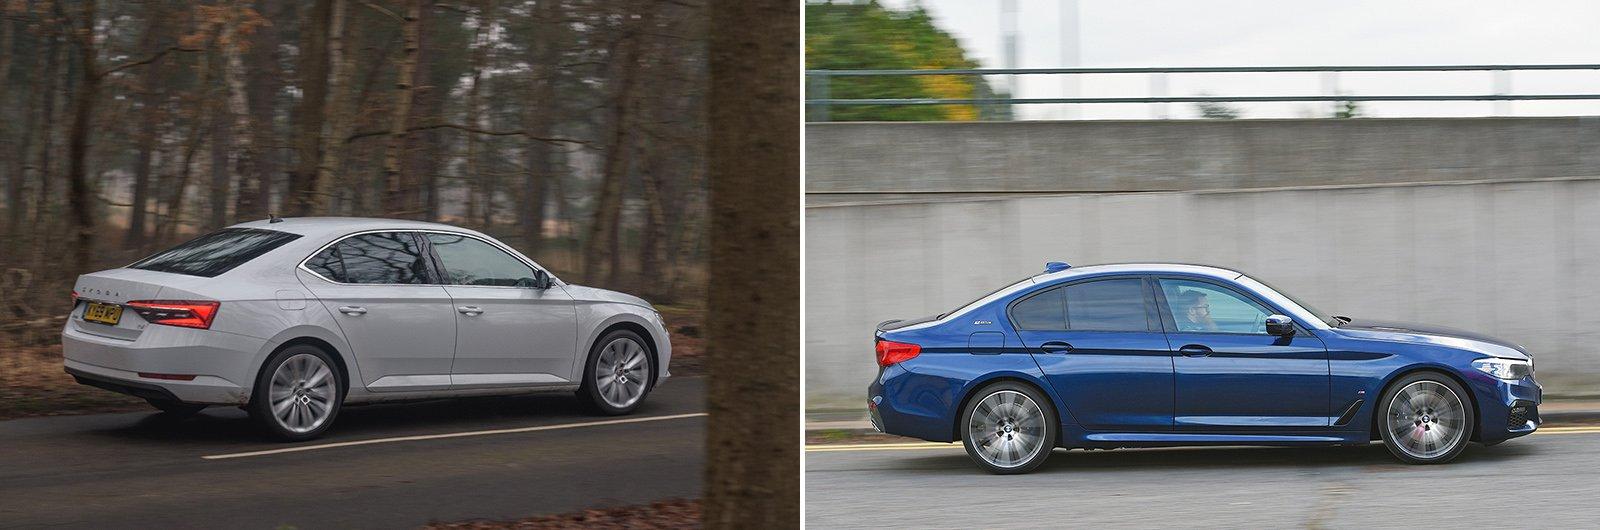 New Skoda Superb iV vs used BMW 530e: – driving